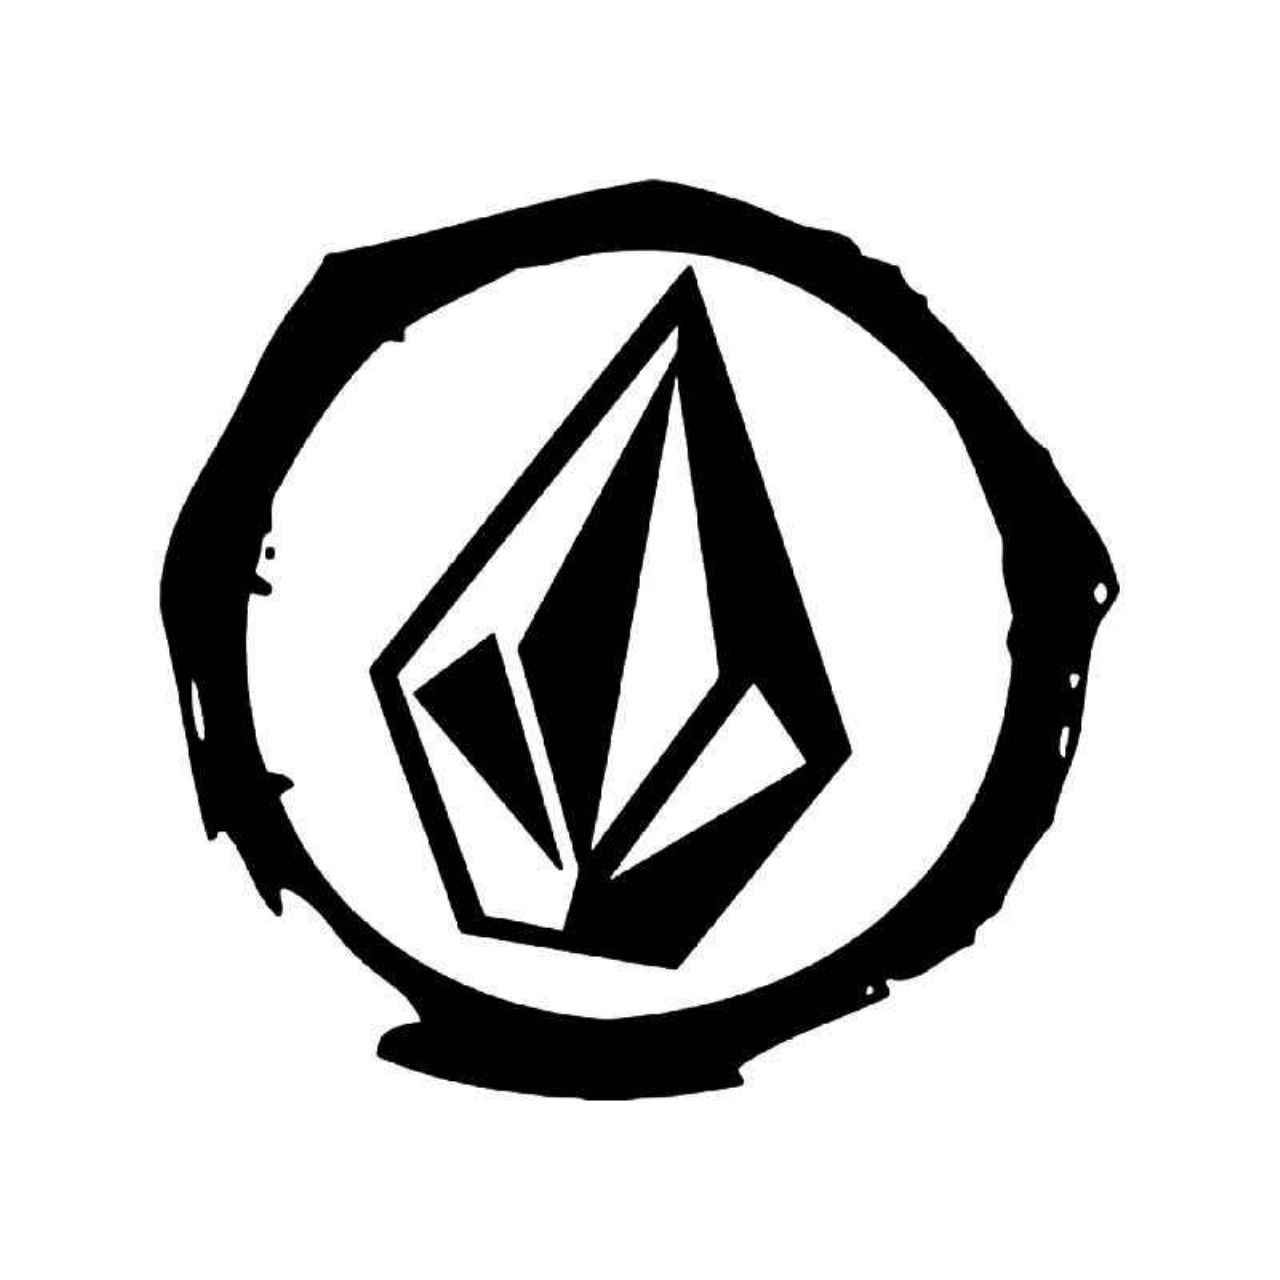 Volcom diamond logo 4 vinyl decal sticker diamond logo volcom diamond logo 4 vinyl decal sticker biocorpaavc